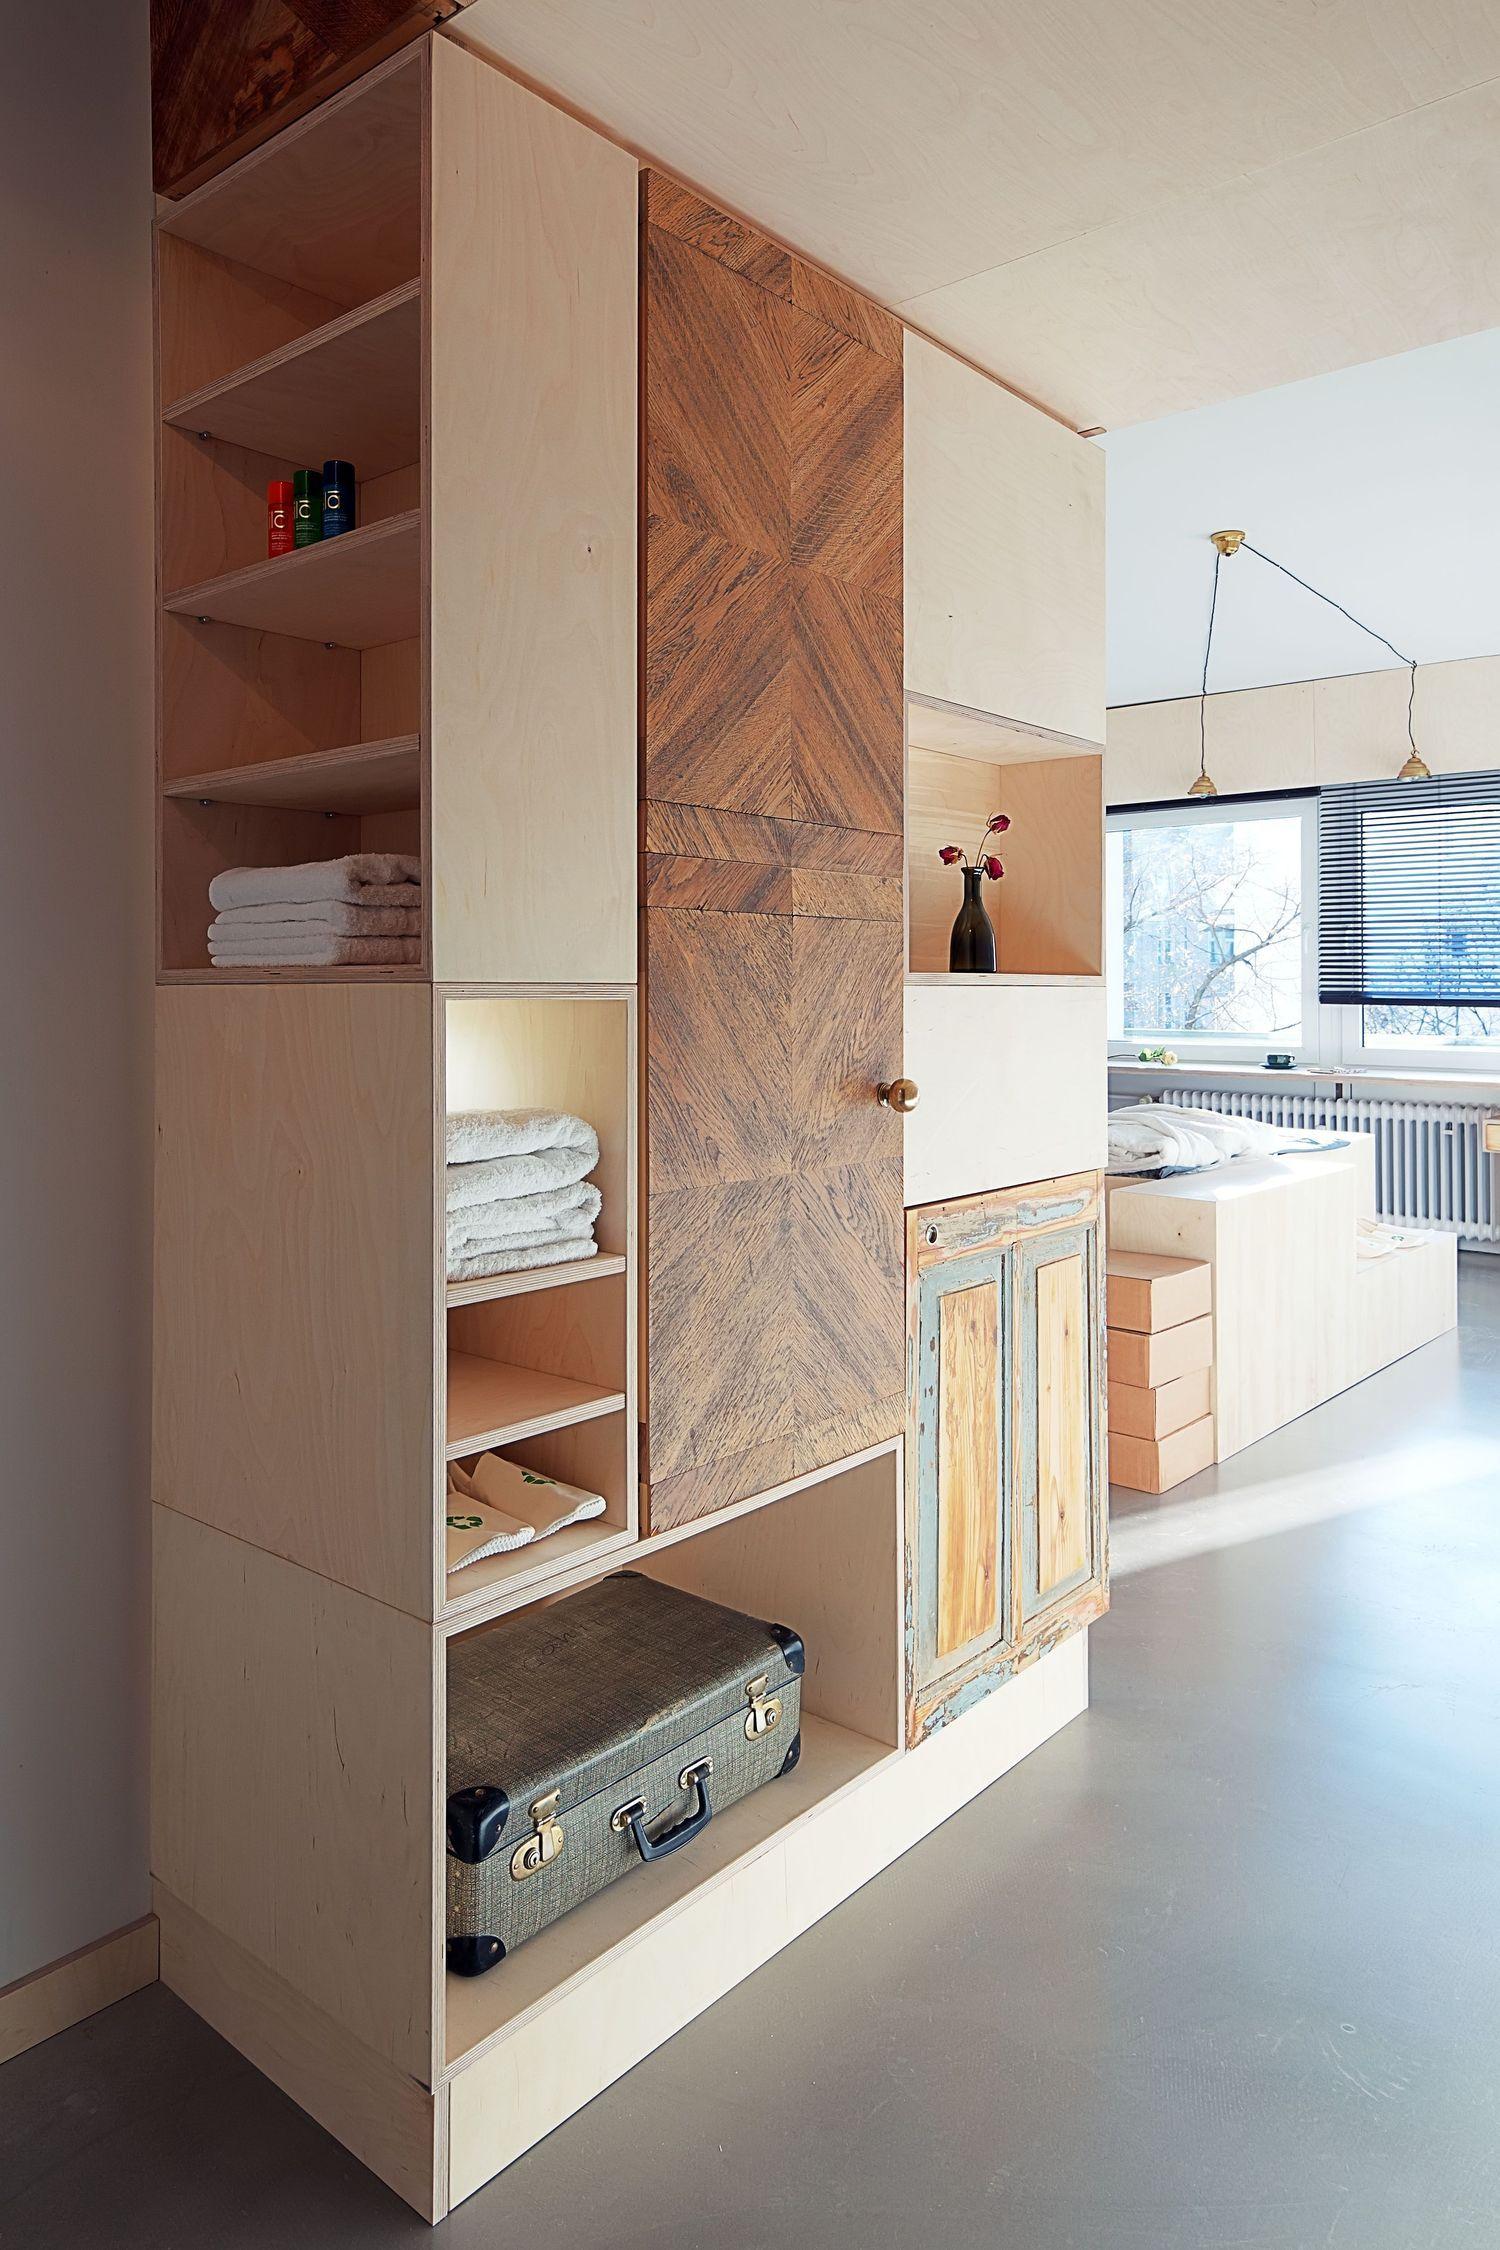 studio 42m2 case piccole grade ideas hotel room design rh pinterest com au